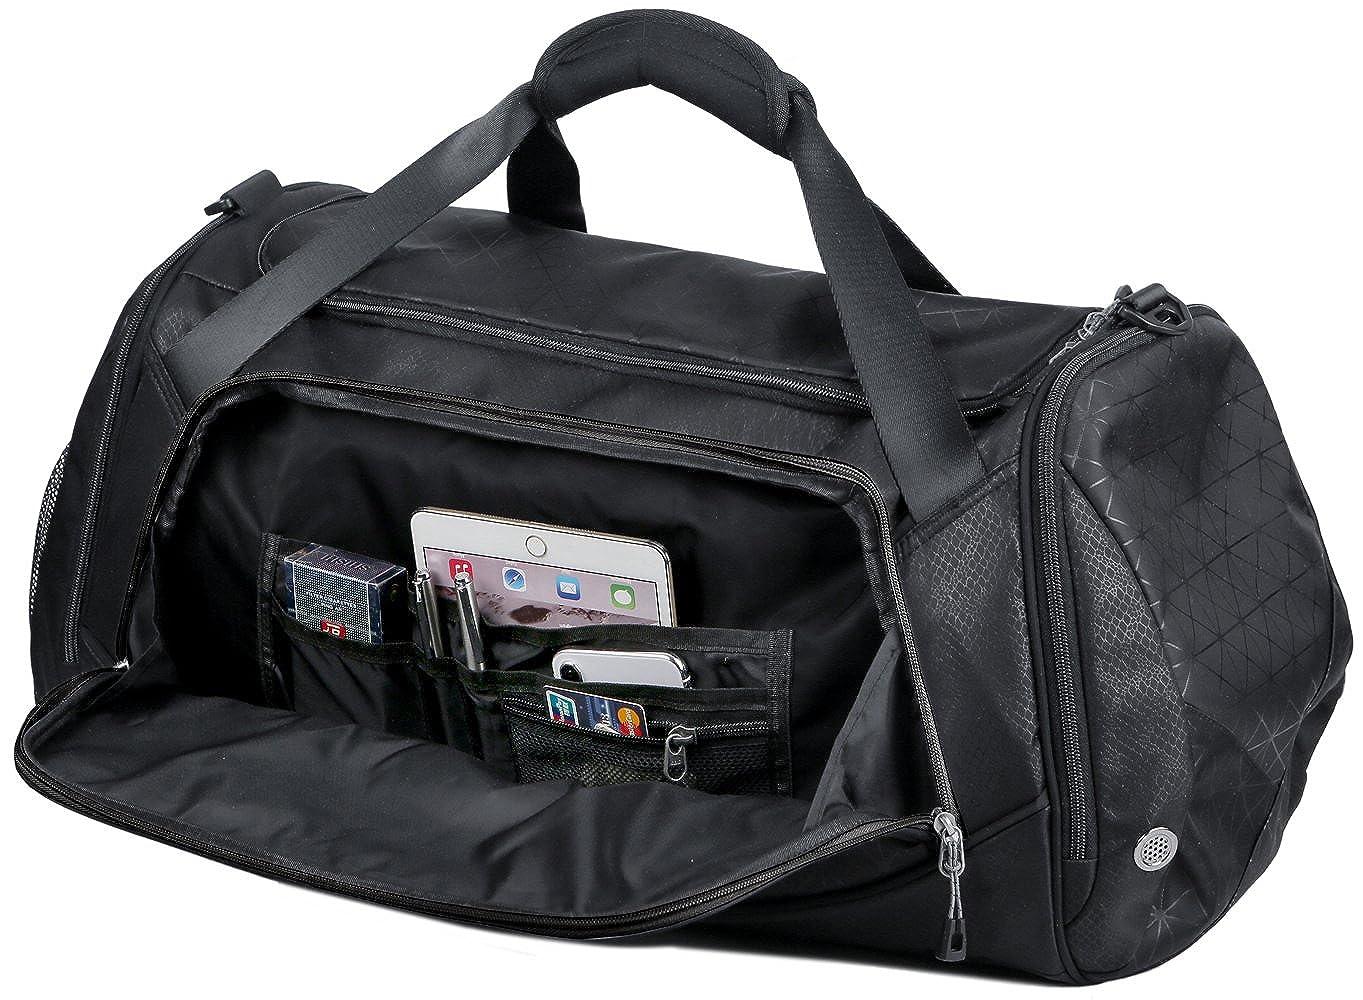 23e80ce475b Amazon.com   Sports Travel Duffel Gym Bag for Men Women with Shoes  Compartment - Mouteenoo (One Size, Black)   Sports Duffels